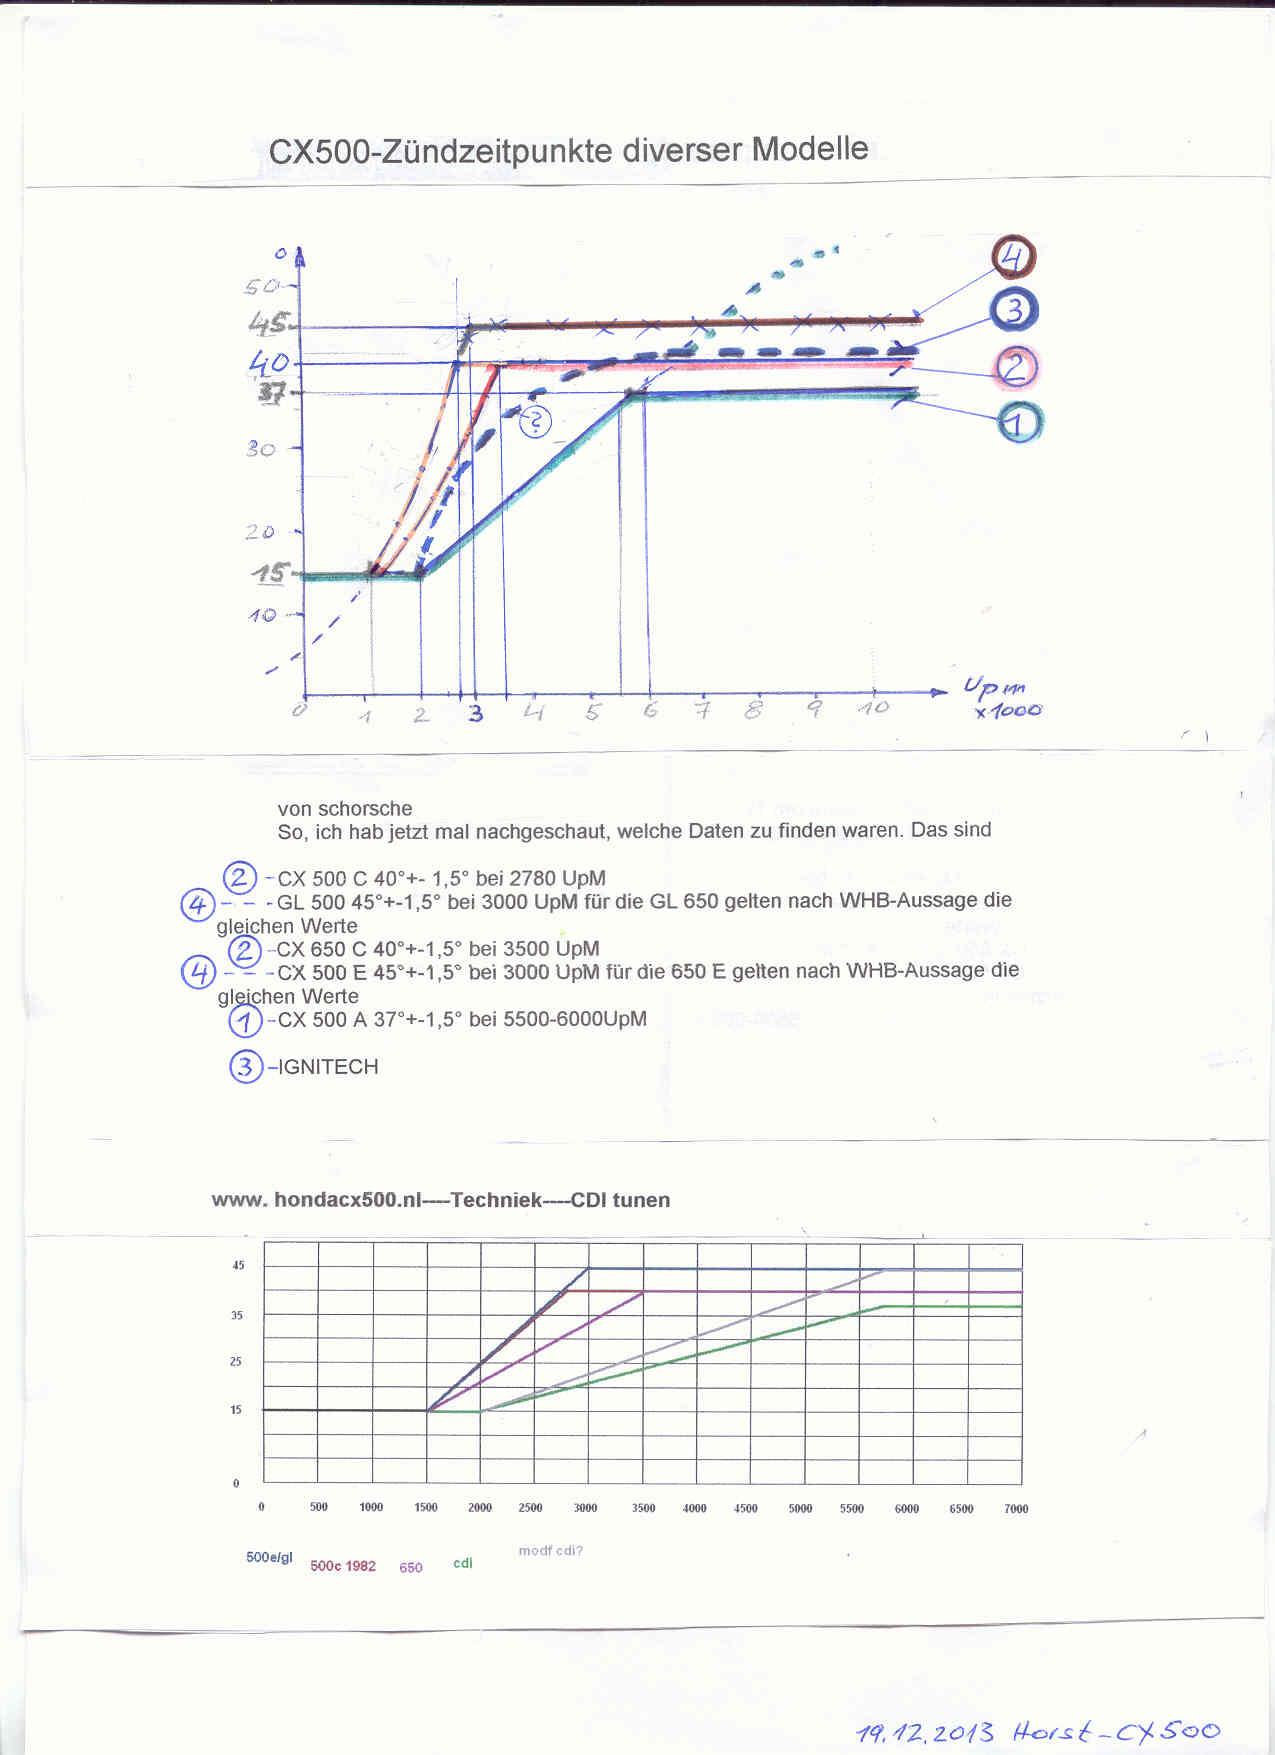 Ignitech: Zündkennfeld Cx500-10